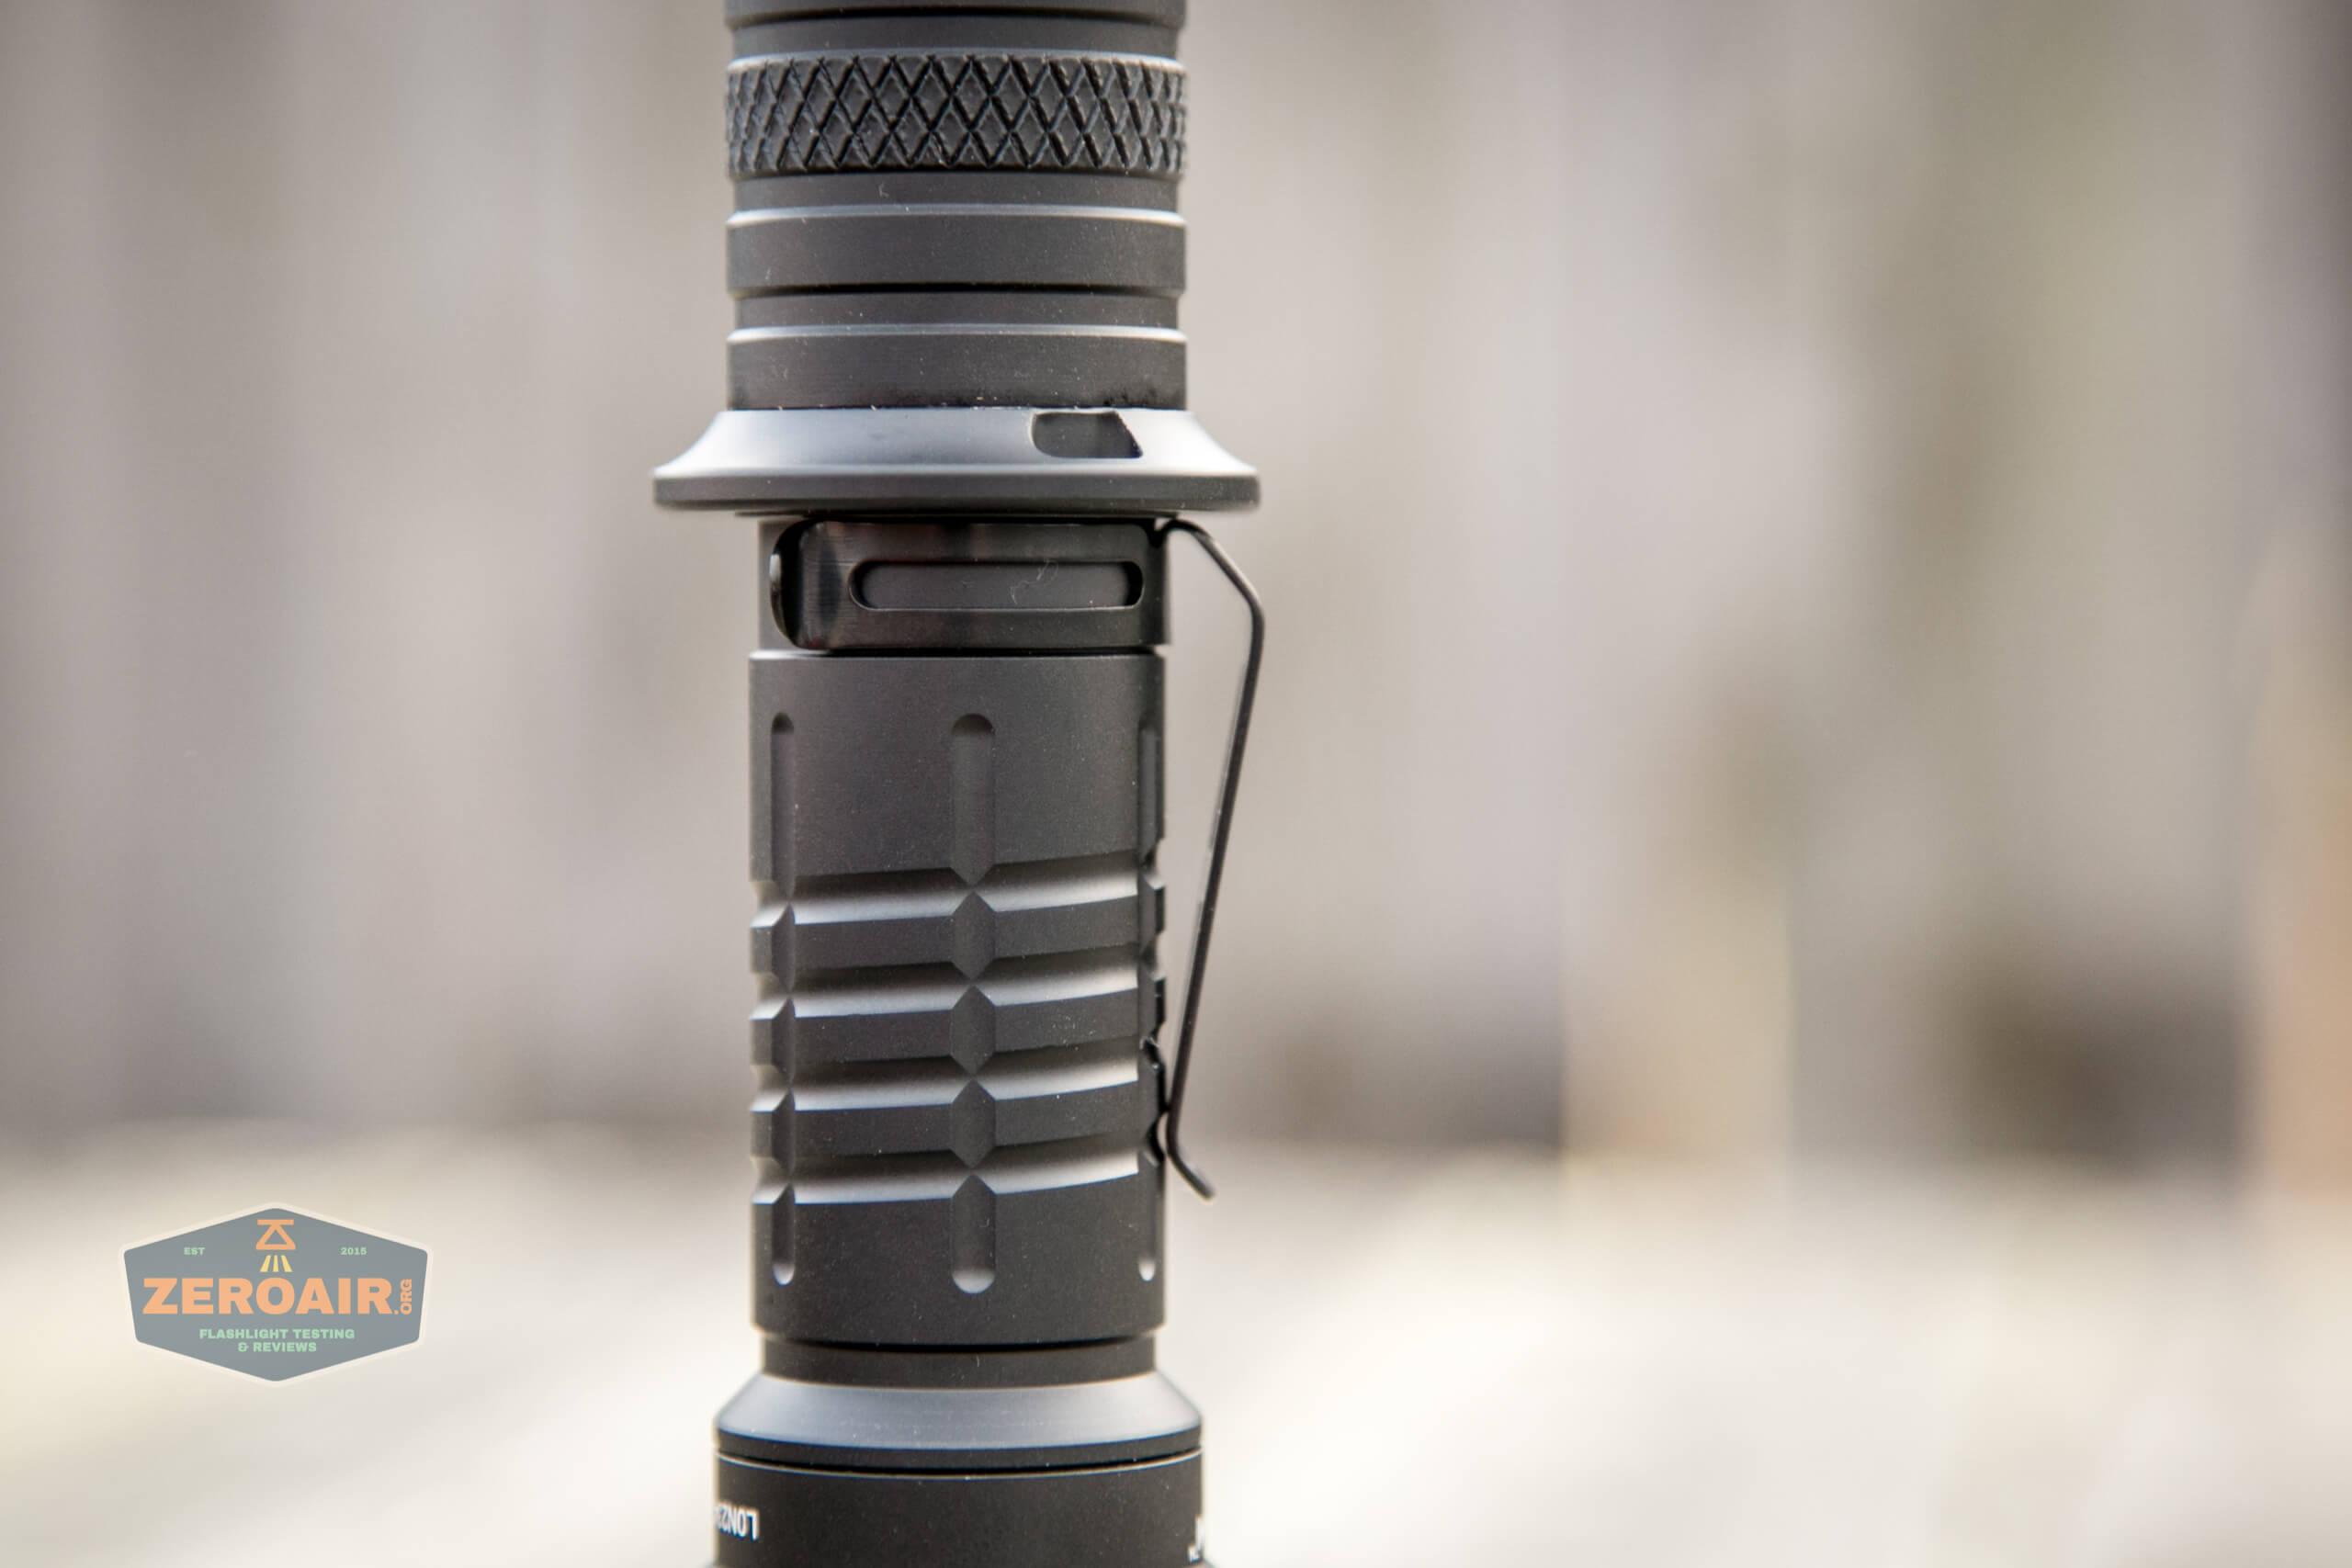 Acebeam L35 brightest tactical flashlight pocket clip detail